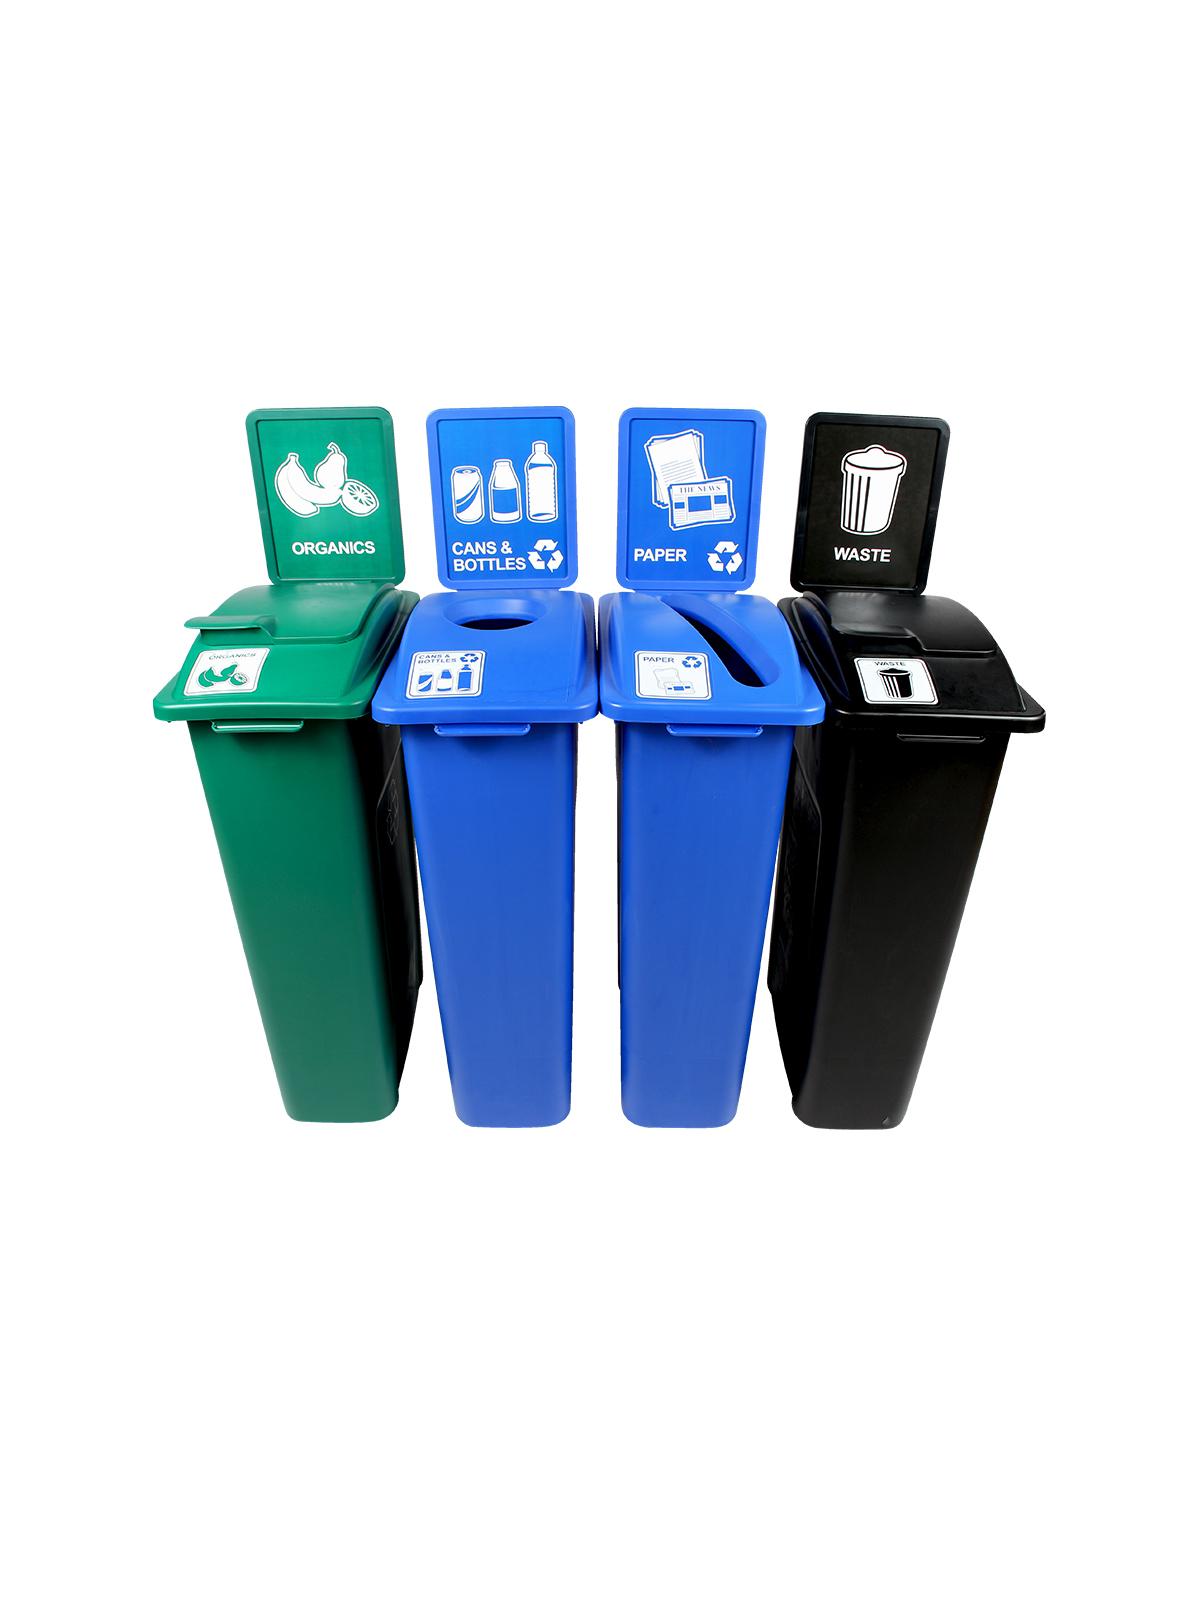 WASTE WATCHER - Quad - Cans & Bottles-Paper-Organics-Waste - Circle-Slot-Solid Lift-Solid Lift - Blue-Blue-Green-Black